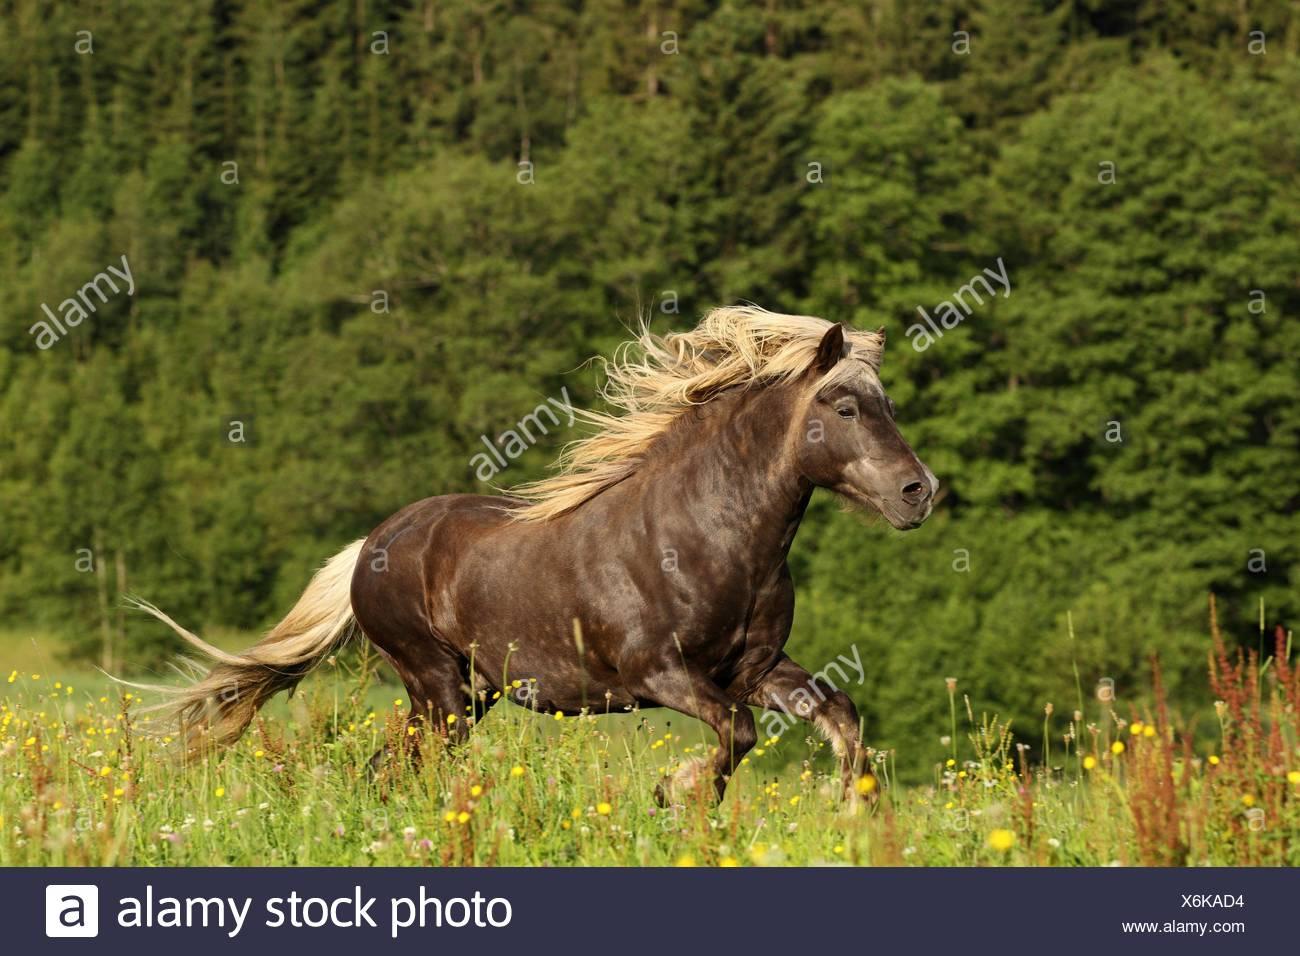 galloping Icelandic horse - Stock Image